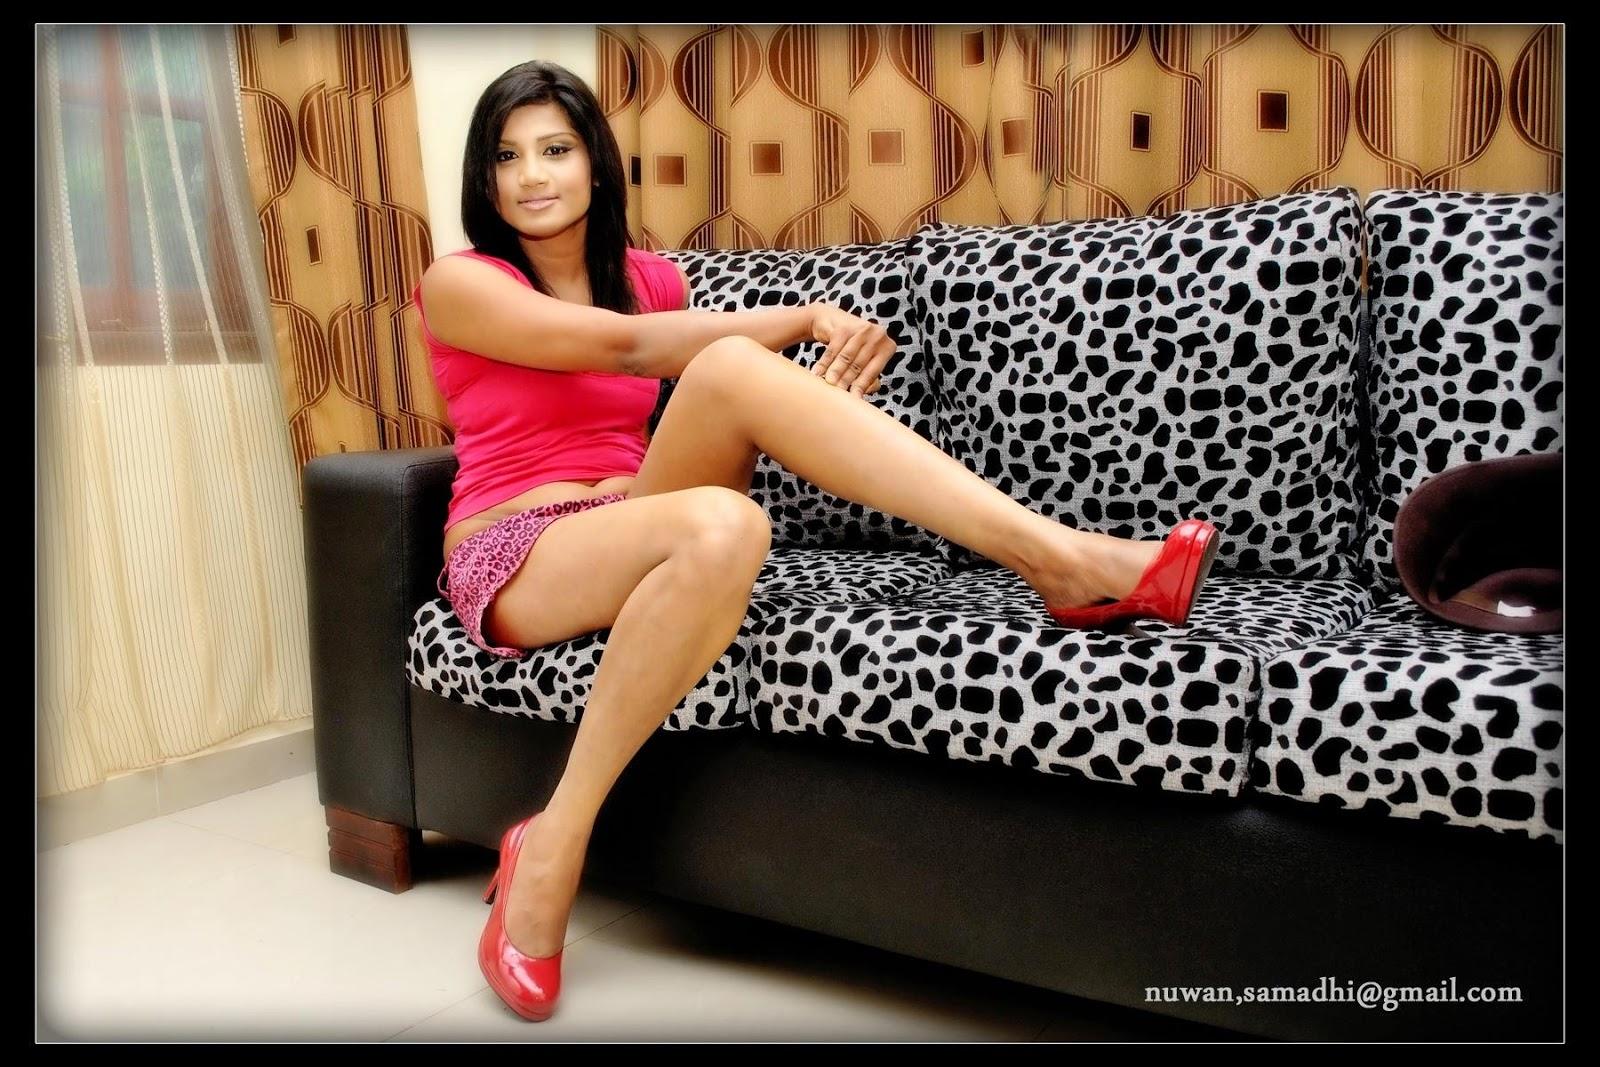 Thilini Gunasekara thighs